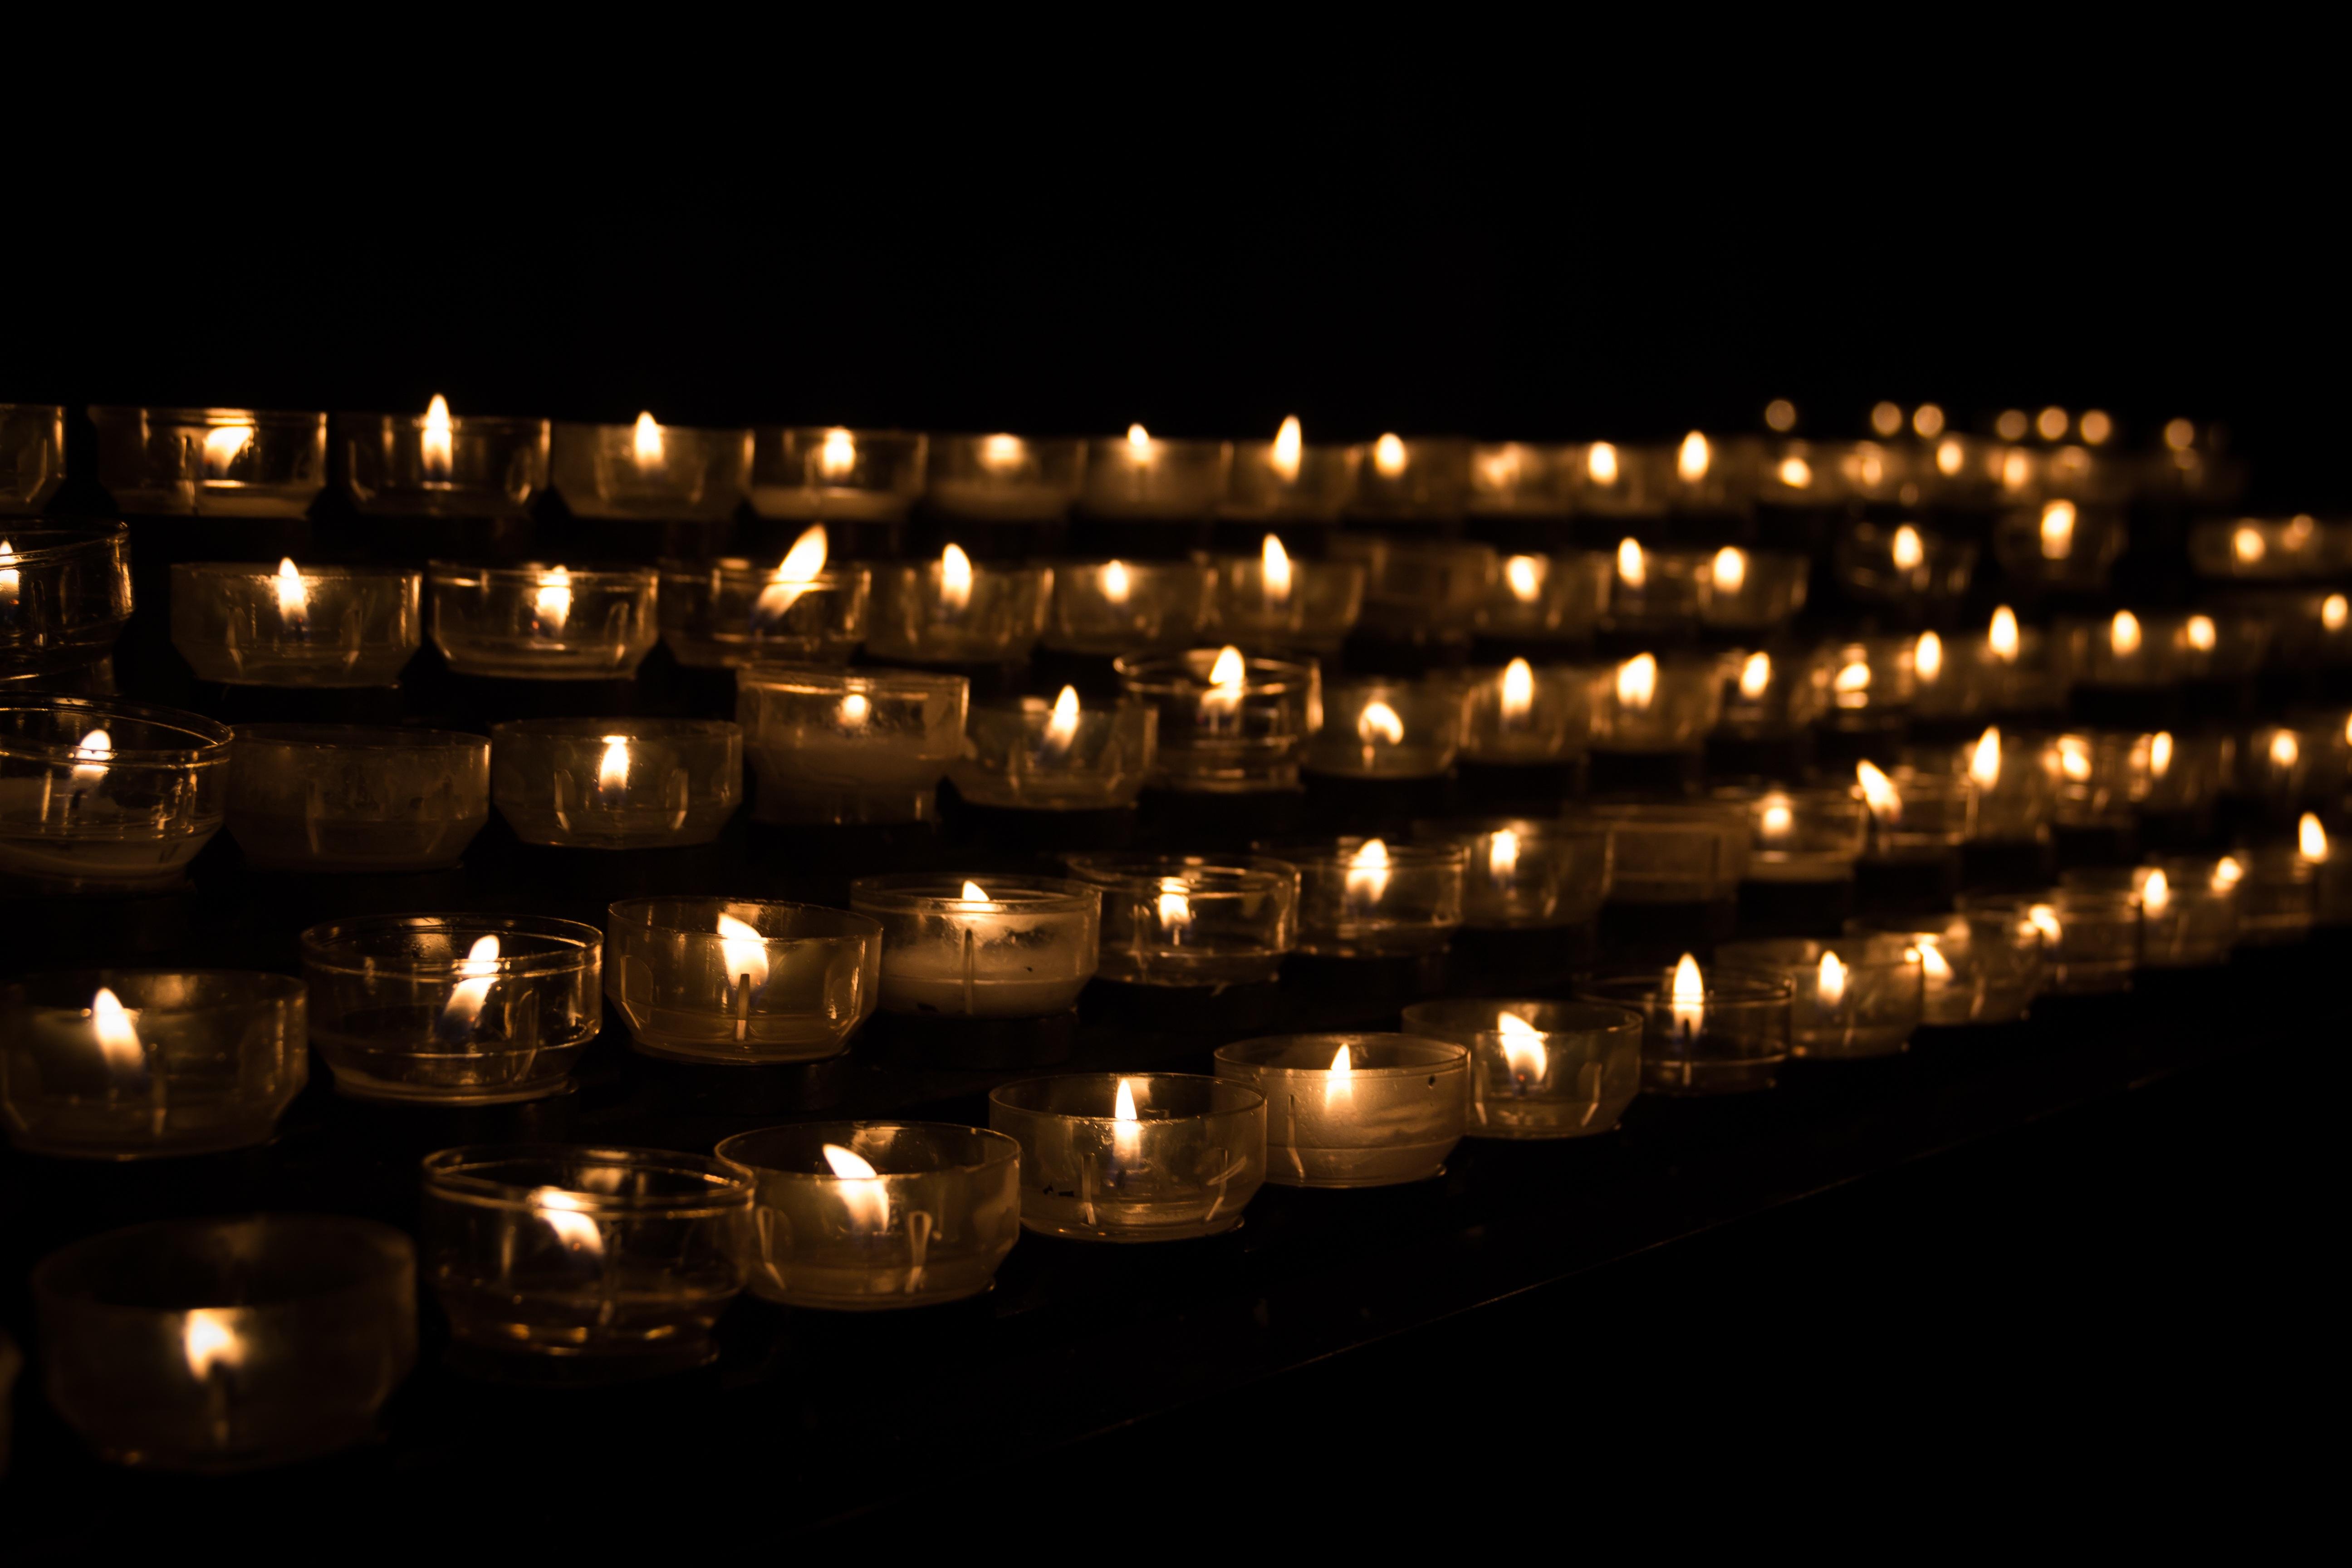 Decoration Peace Fire Religion Darkness Rest Christian Christmas Lighting Circle Pray Font Memorial Lights Bright Light Fixture Prayer